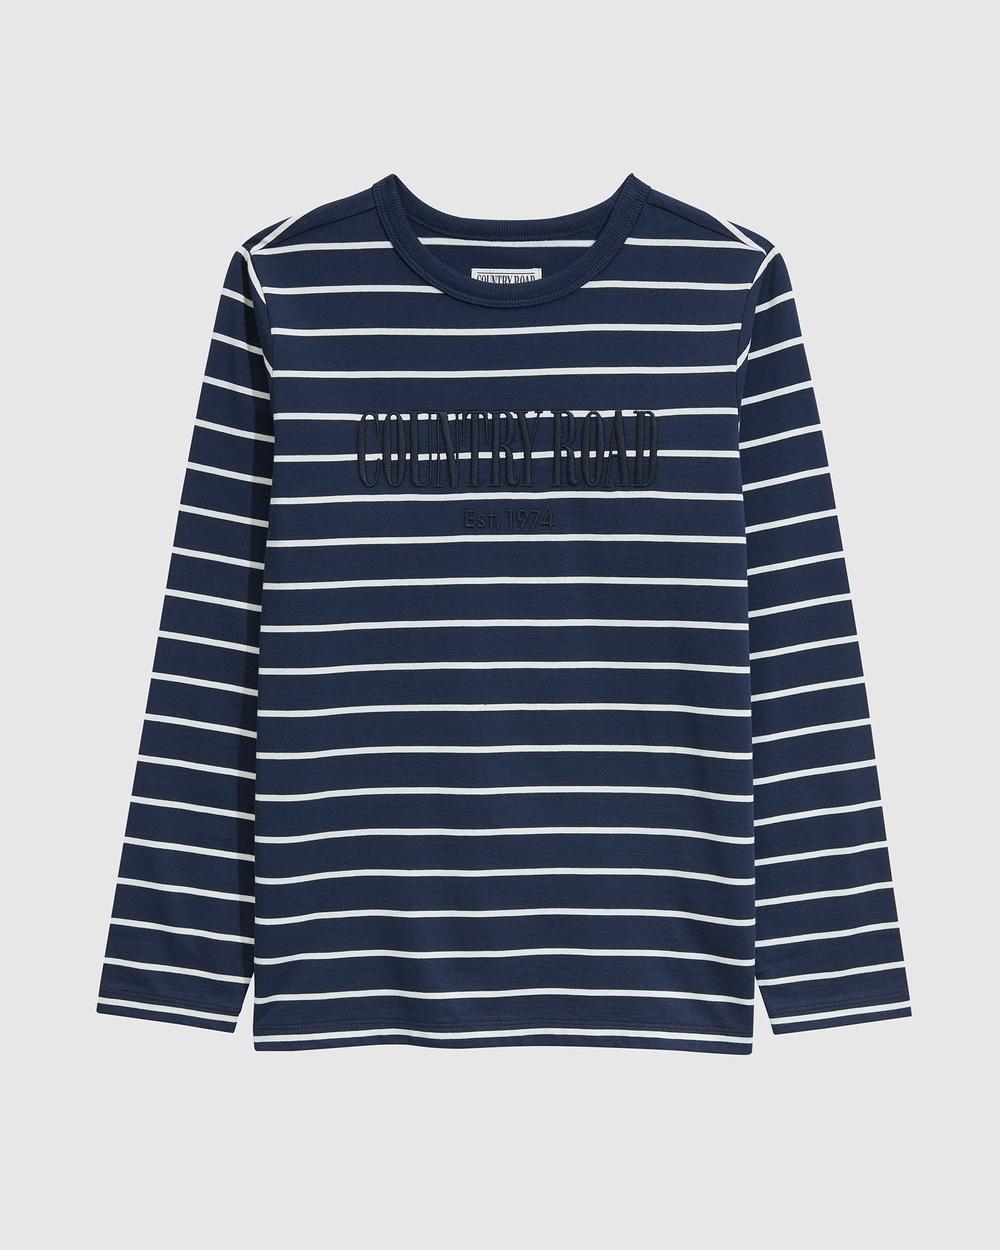 Country Road Teen Verified Australian Cotton Heritage T shirt T-Shirts & Singlets blue T-shirt Australia